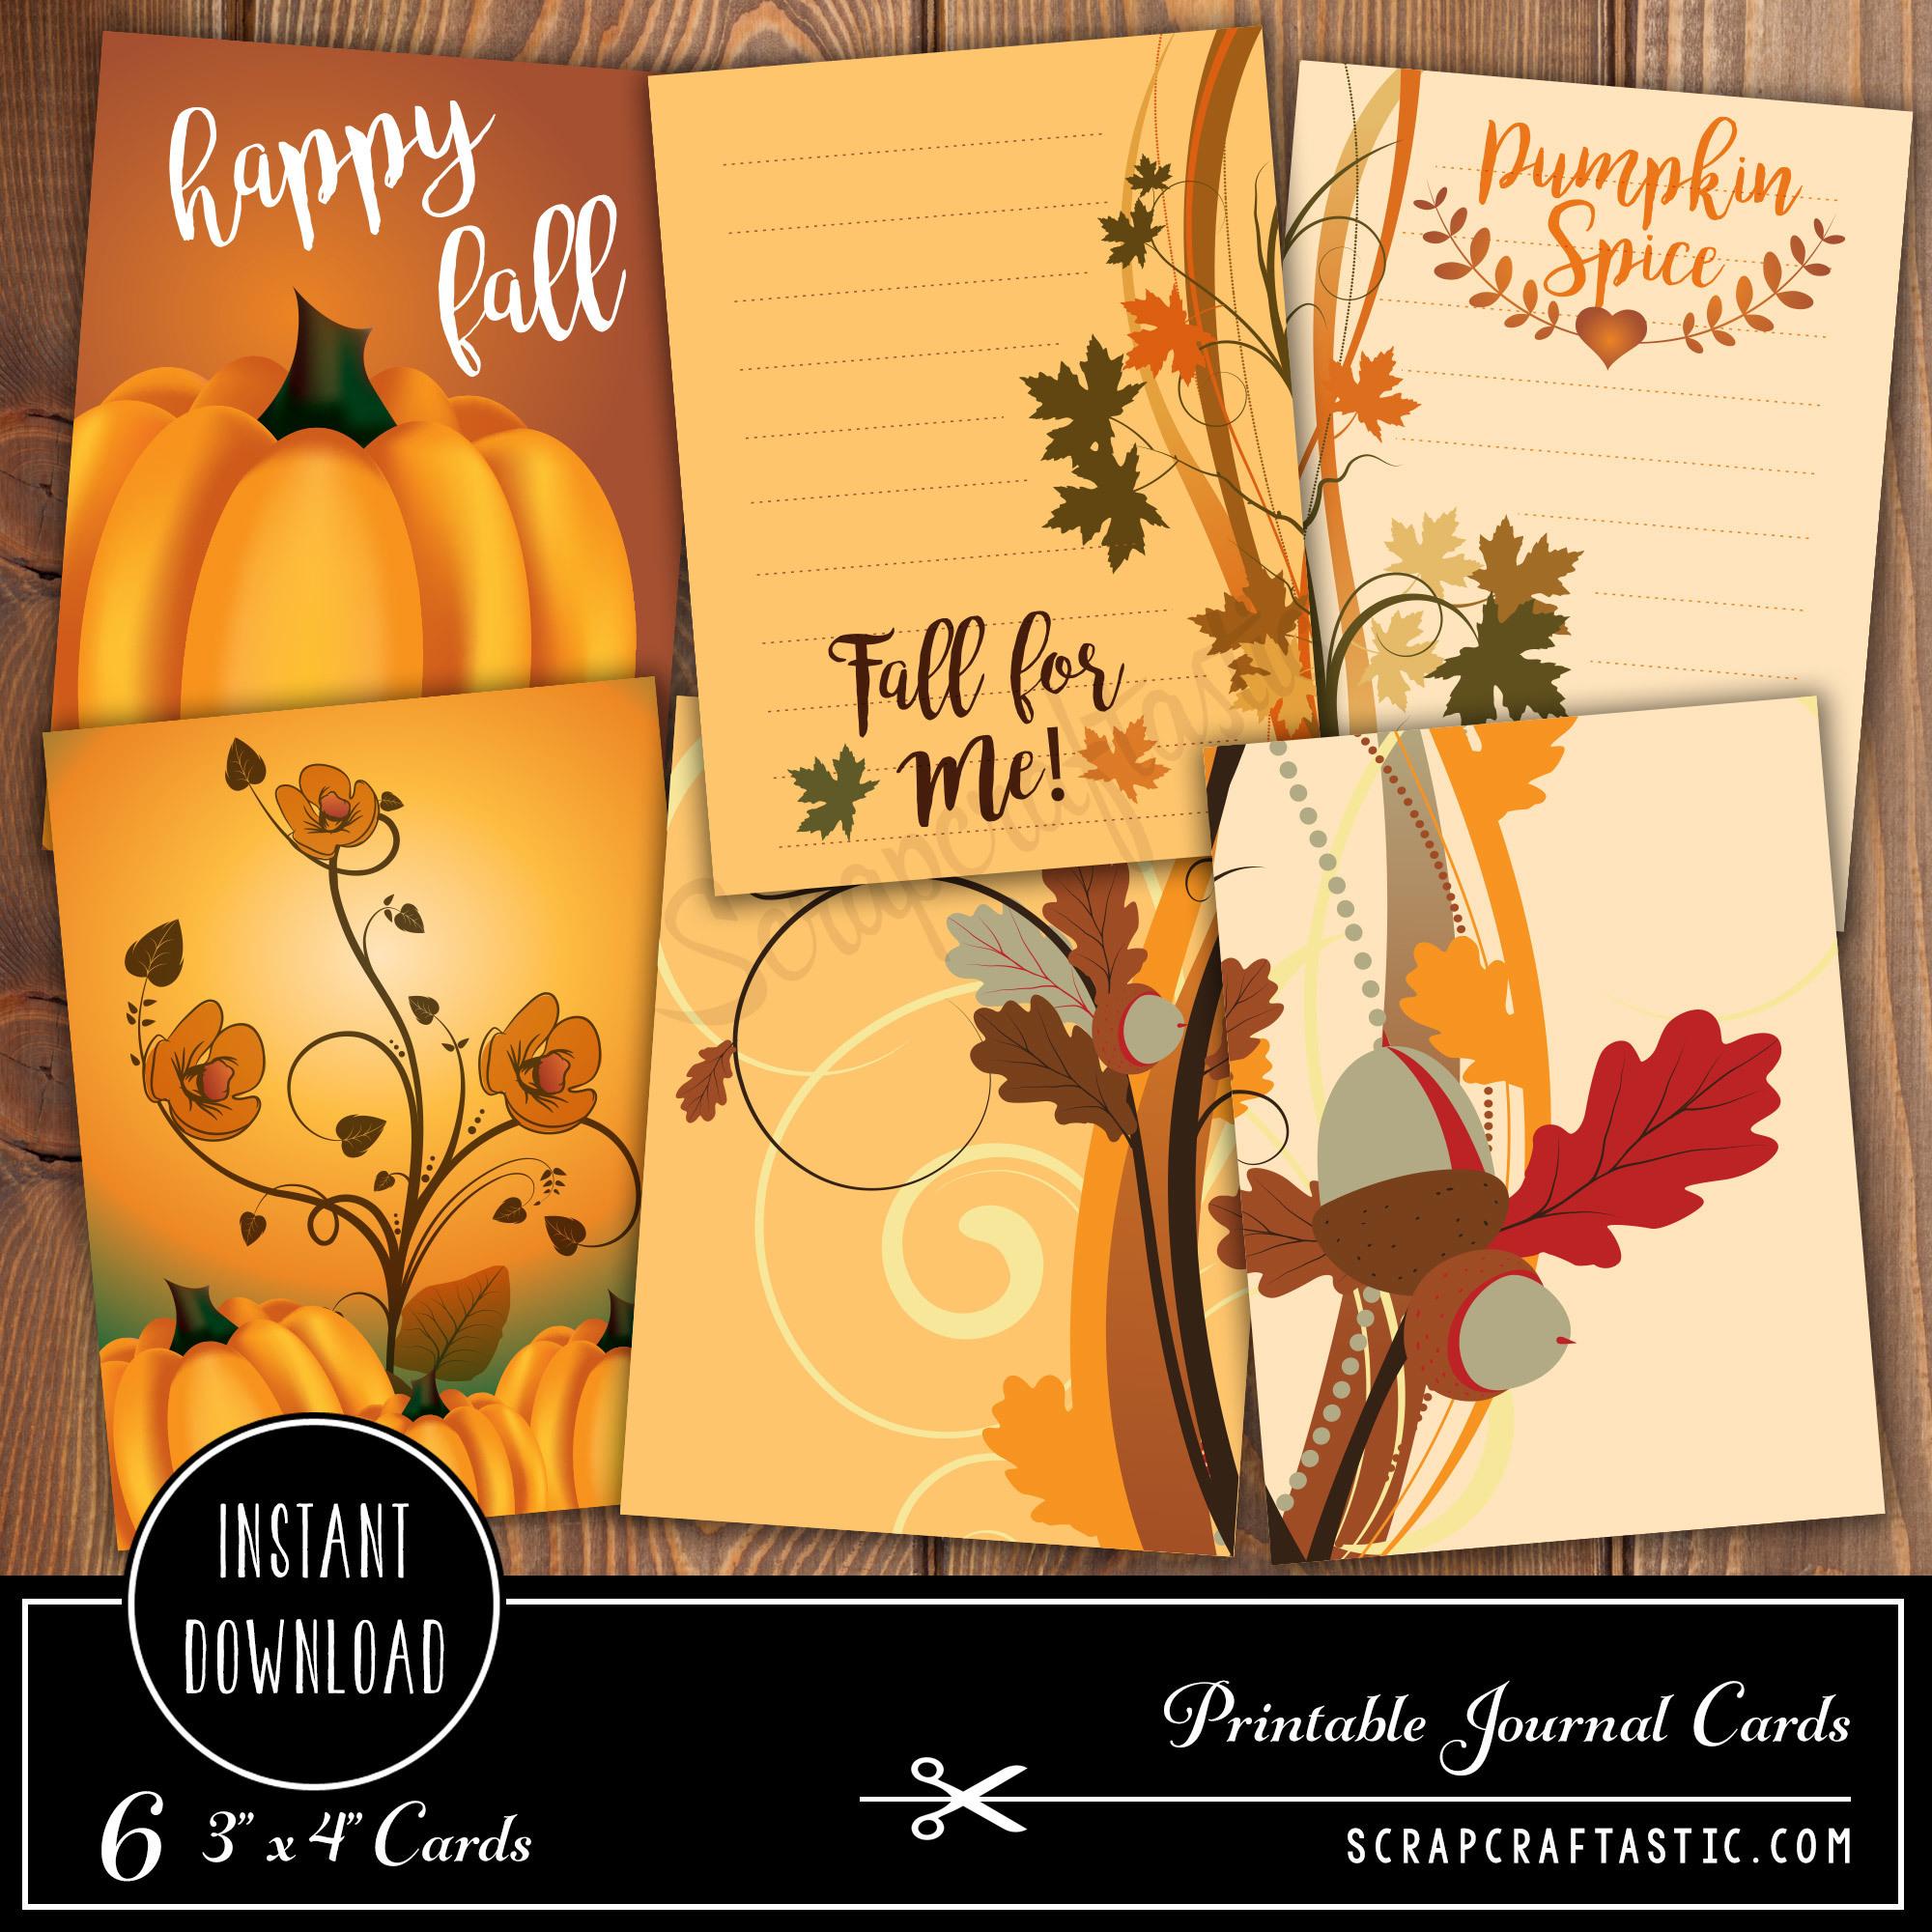 Pumpkin Spice 3x4 Journal Card Digital Collage Print Sheet 05001